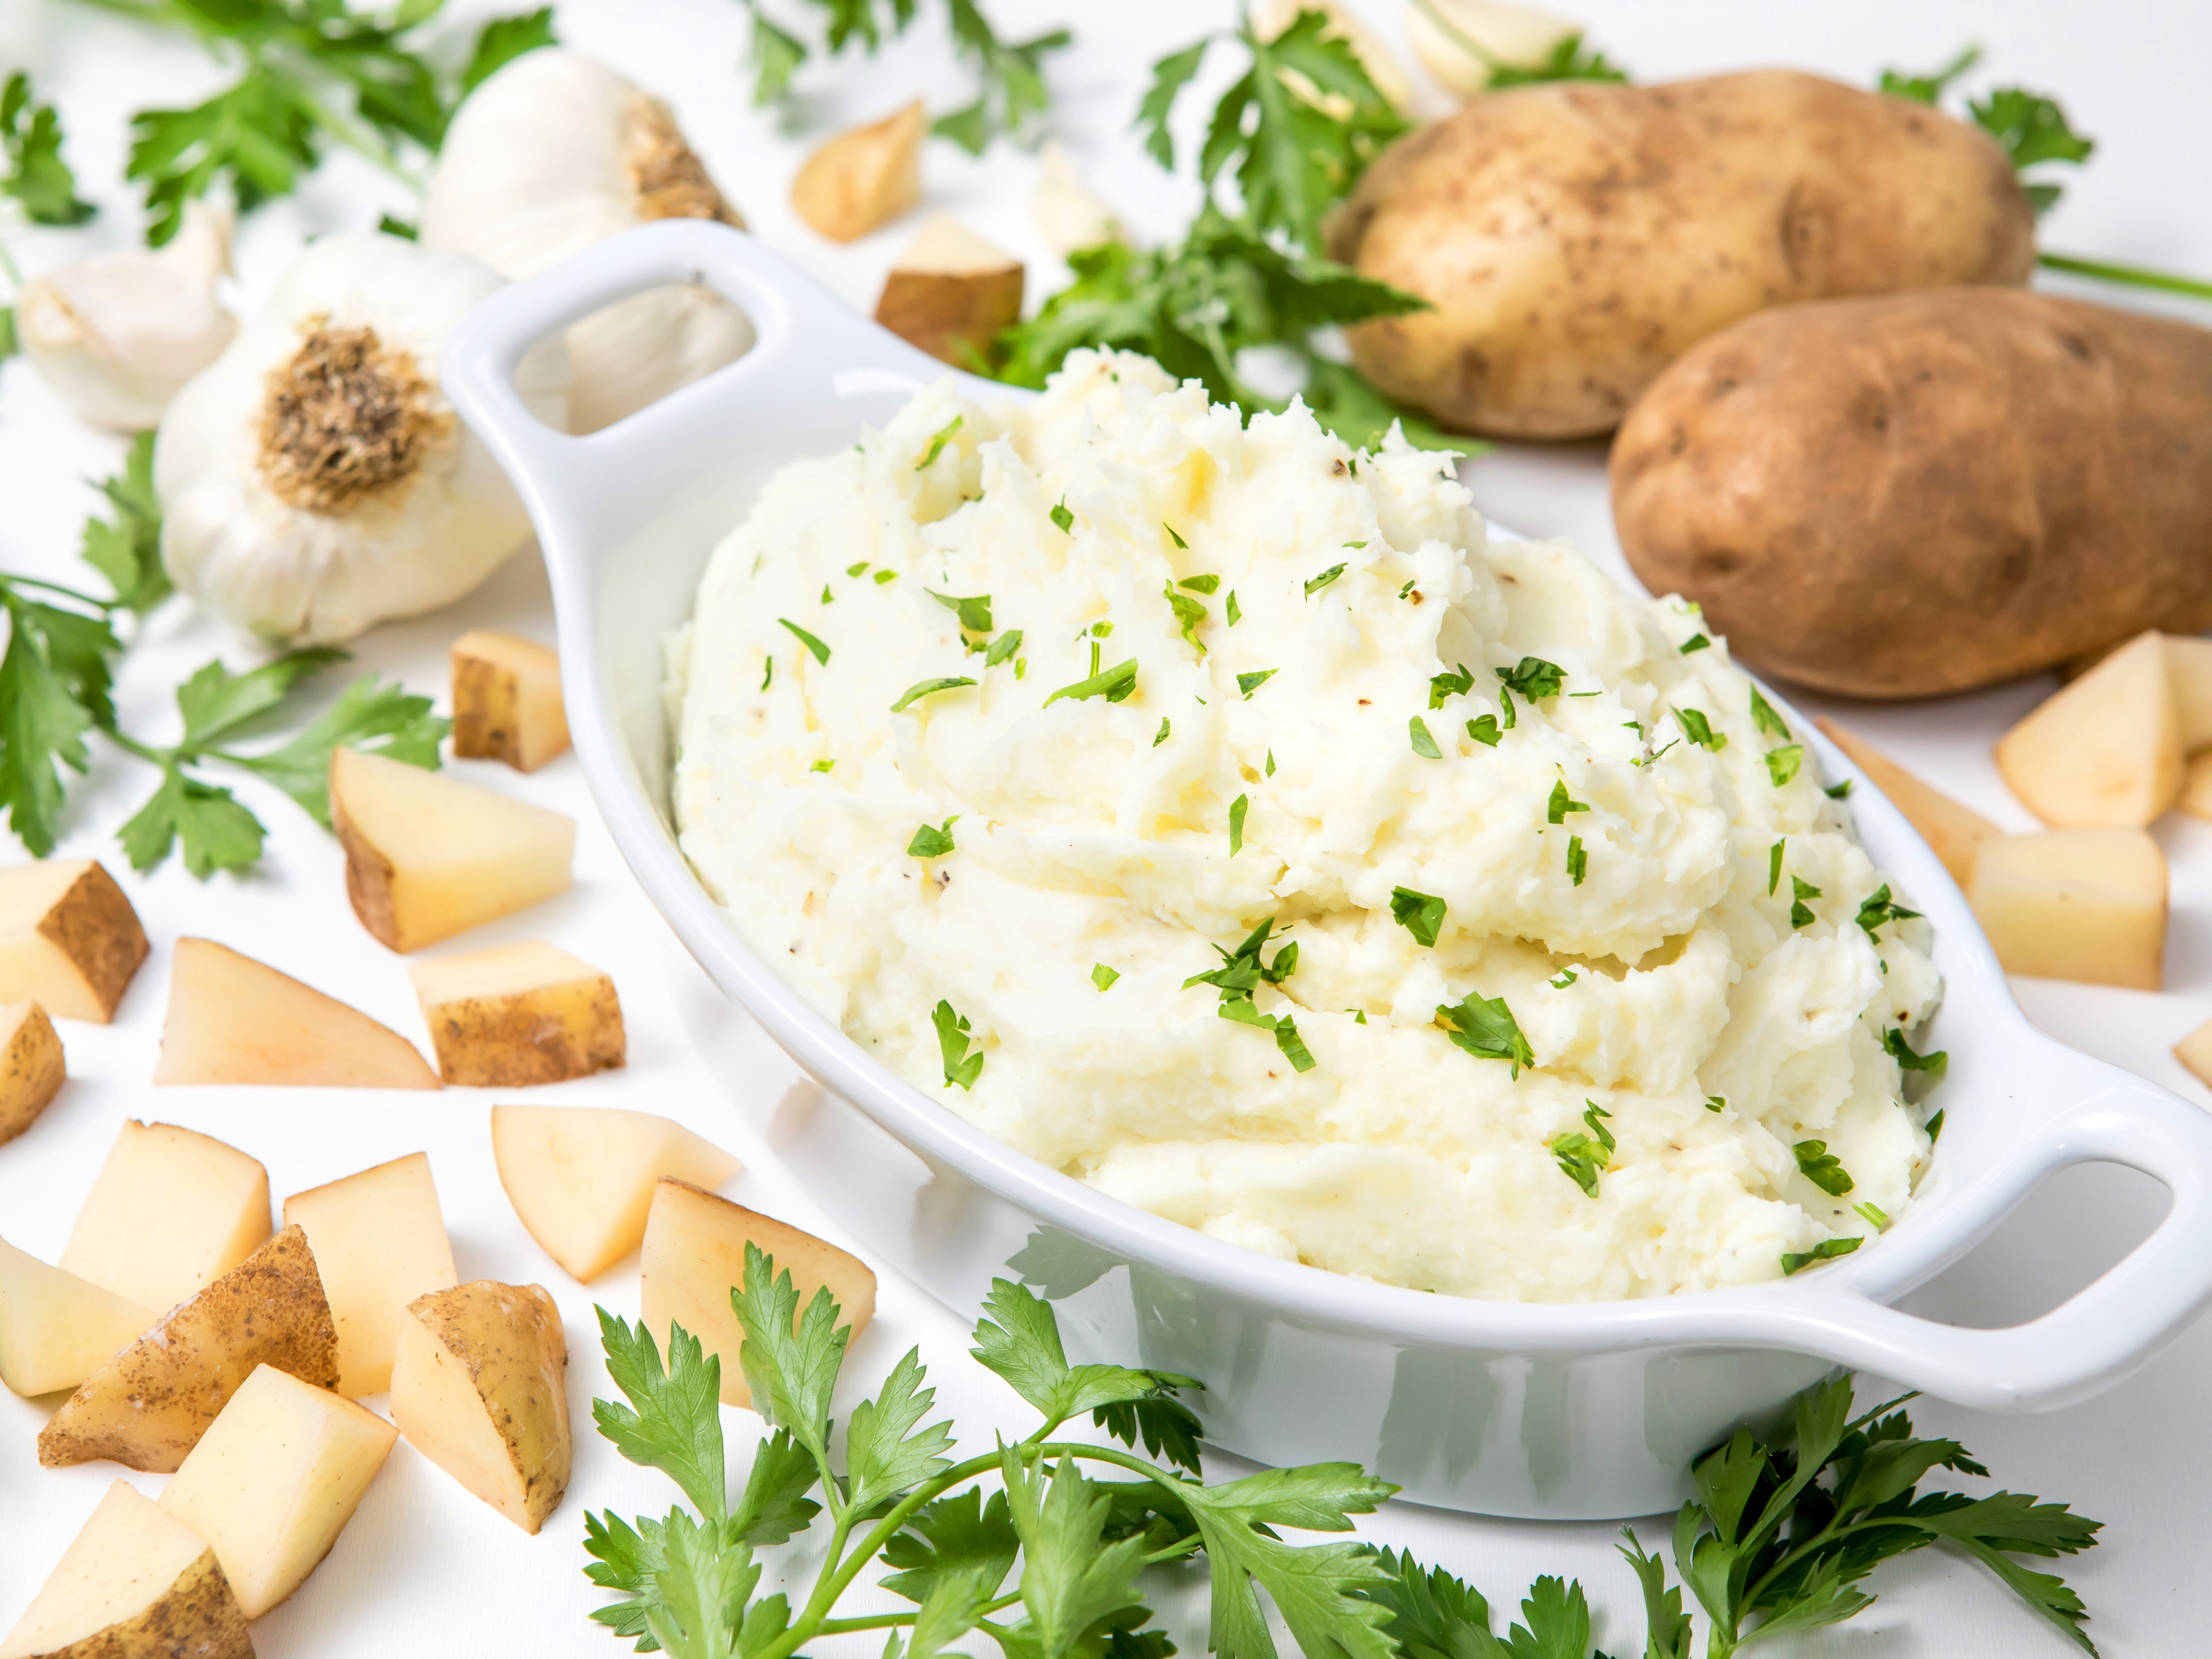 Creamy Greek Yogurt Mashed Potatoes